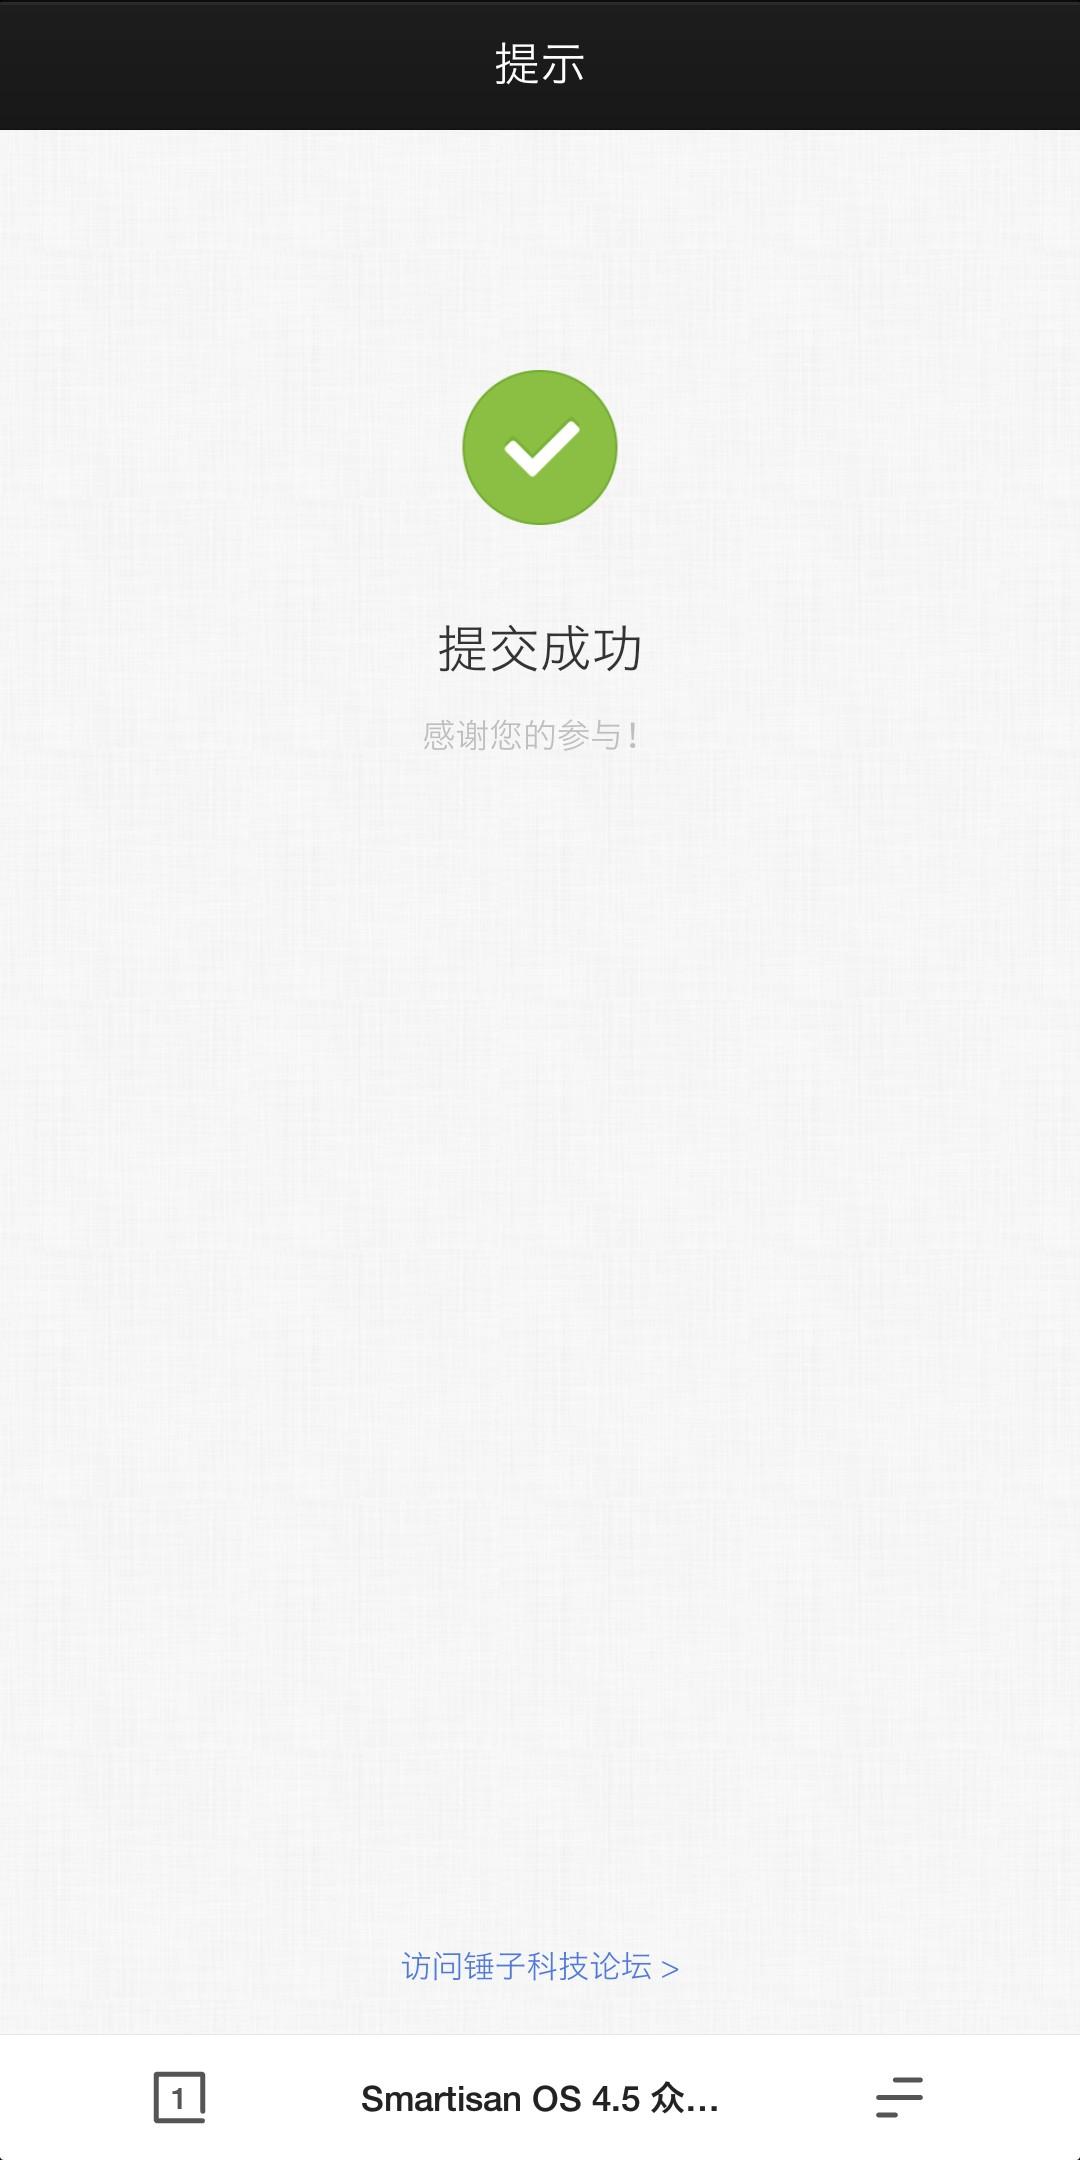 Screenshot_2018-01-02-15-34-37-332_?????.png